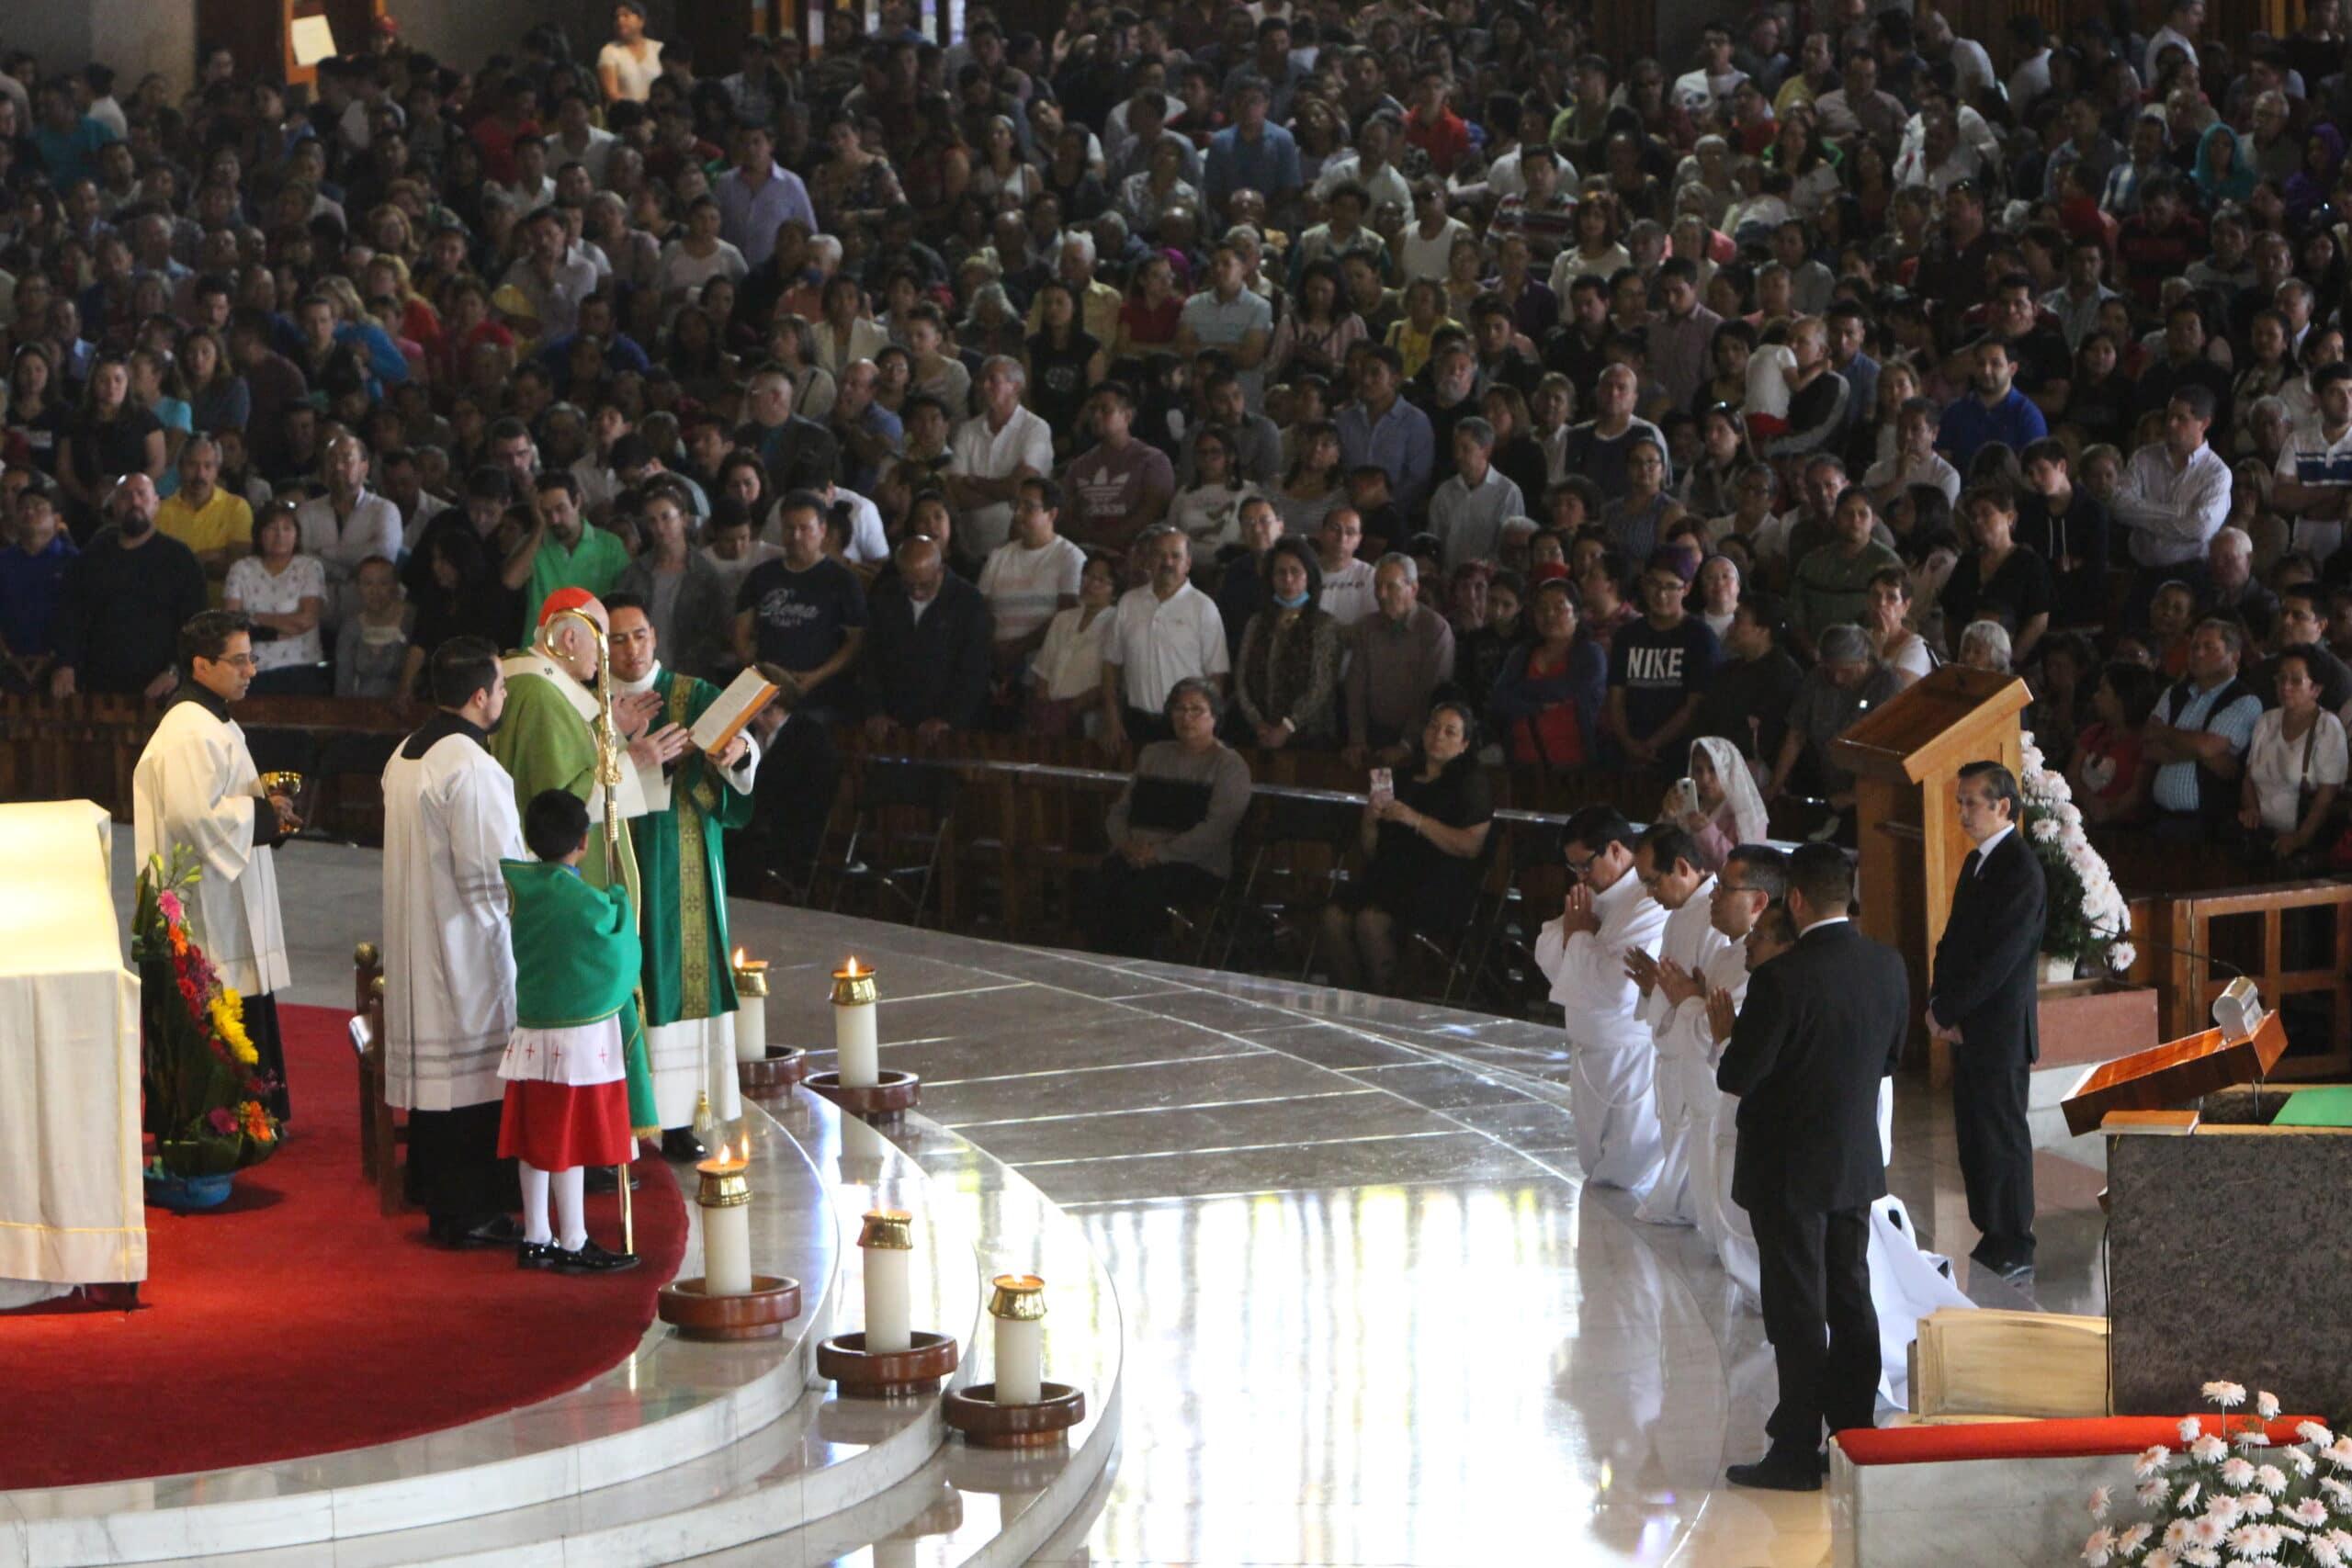 La Misa se llevó a cabo en la Basílica de Guadalupe. Foto: INBG.